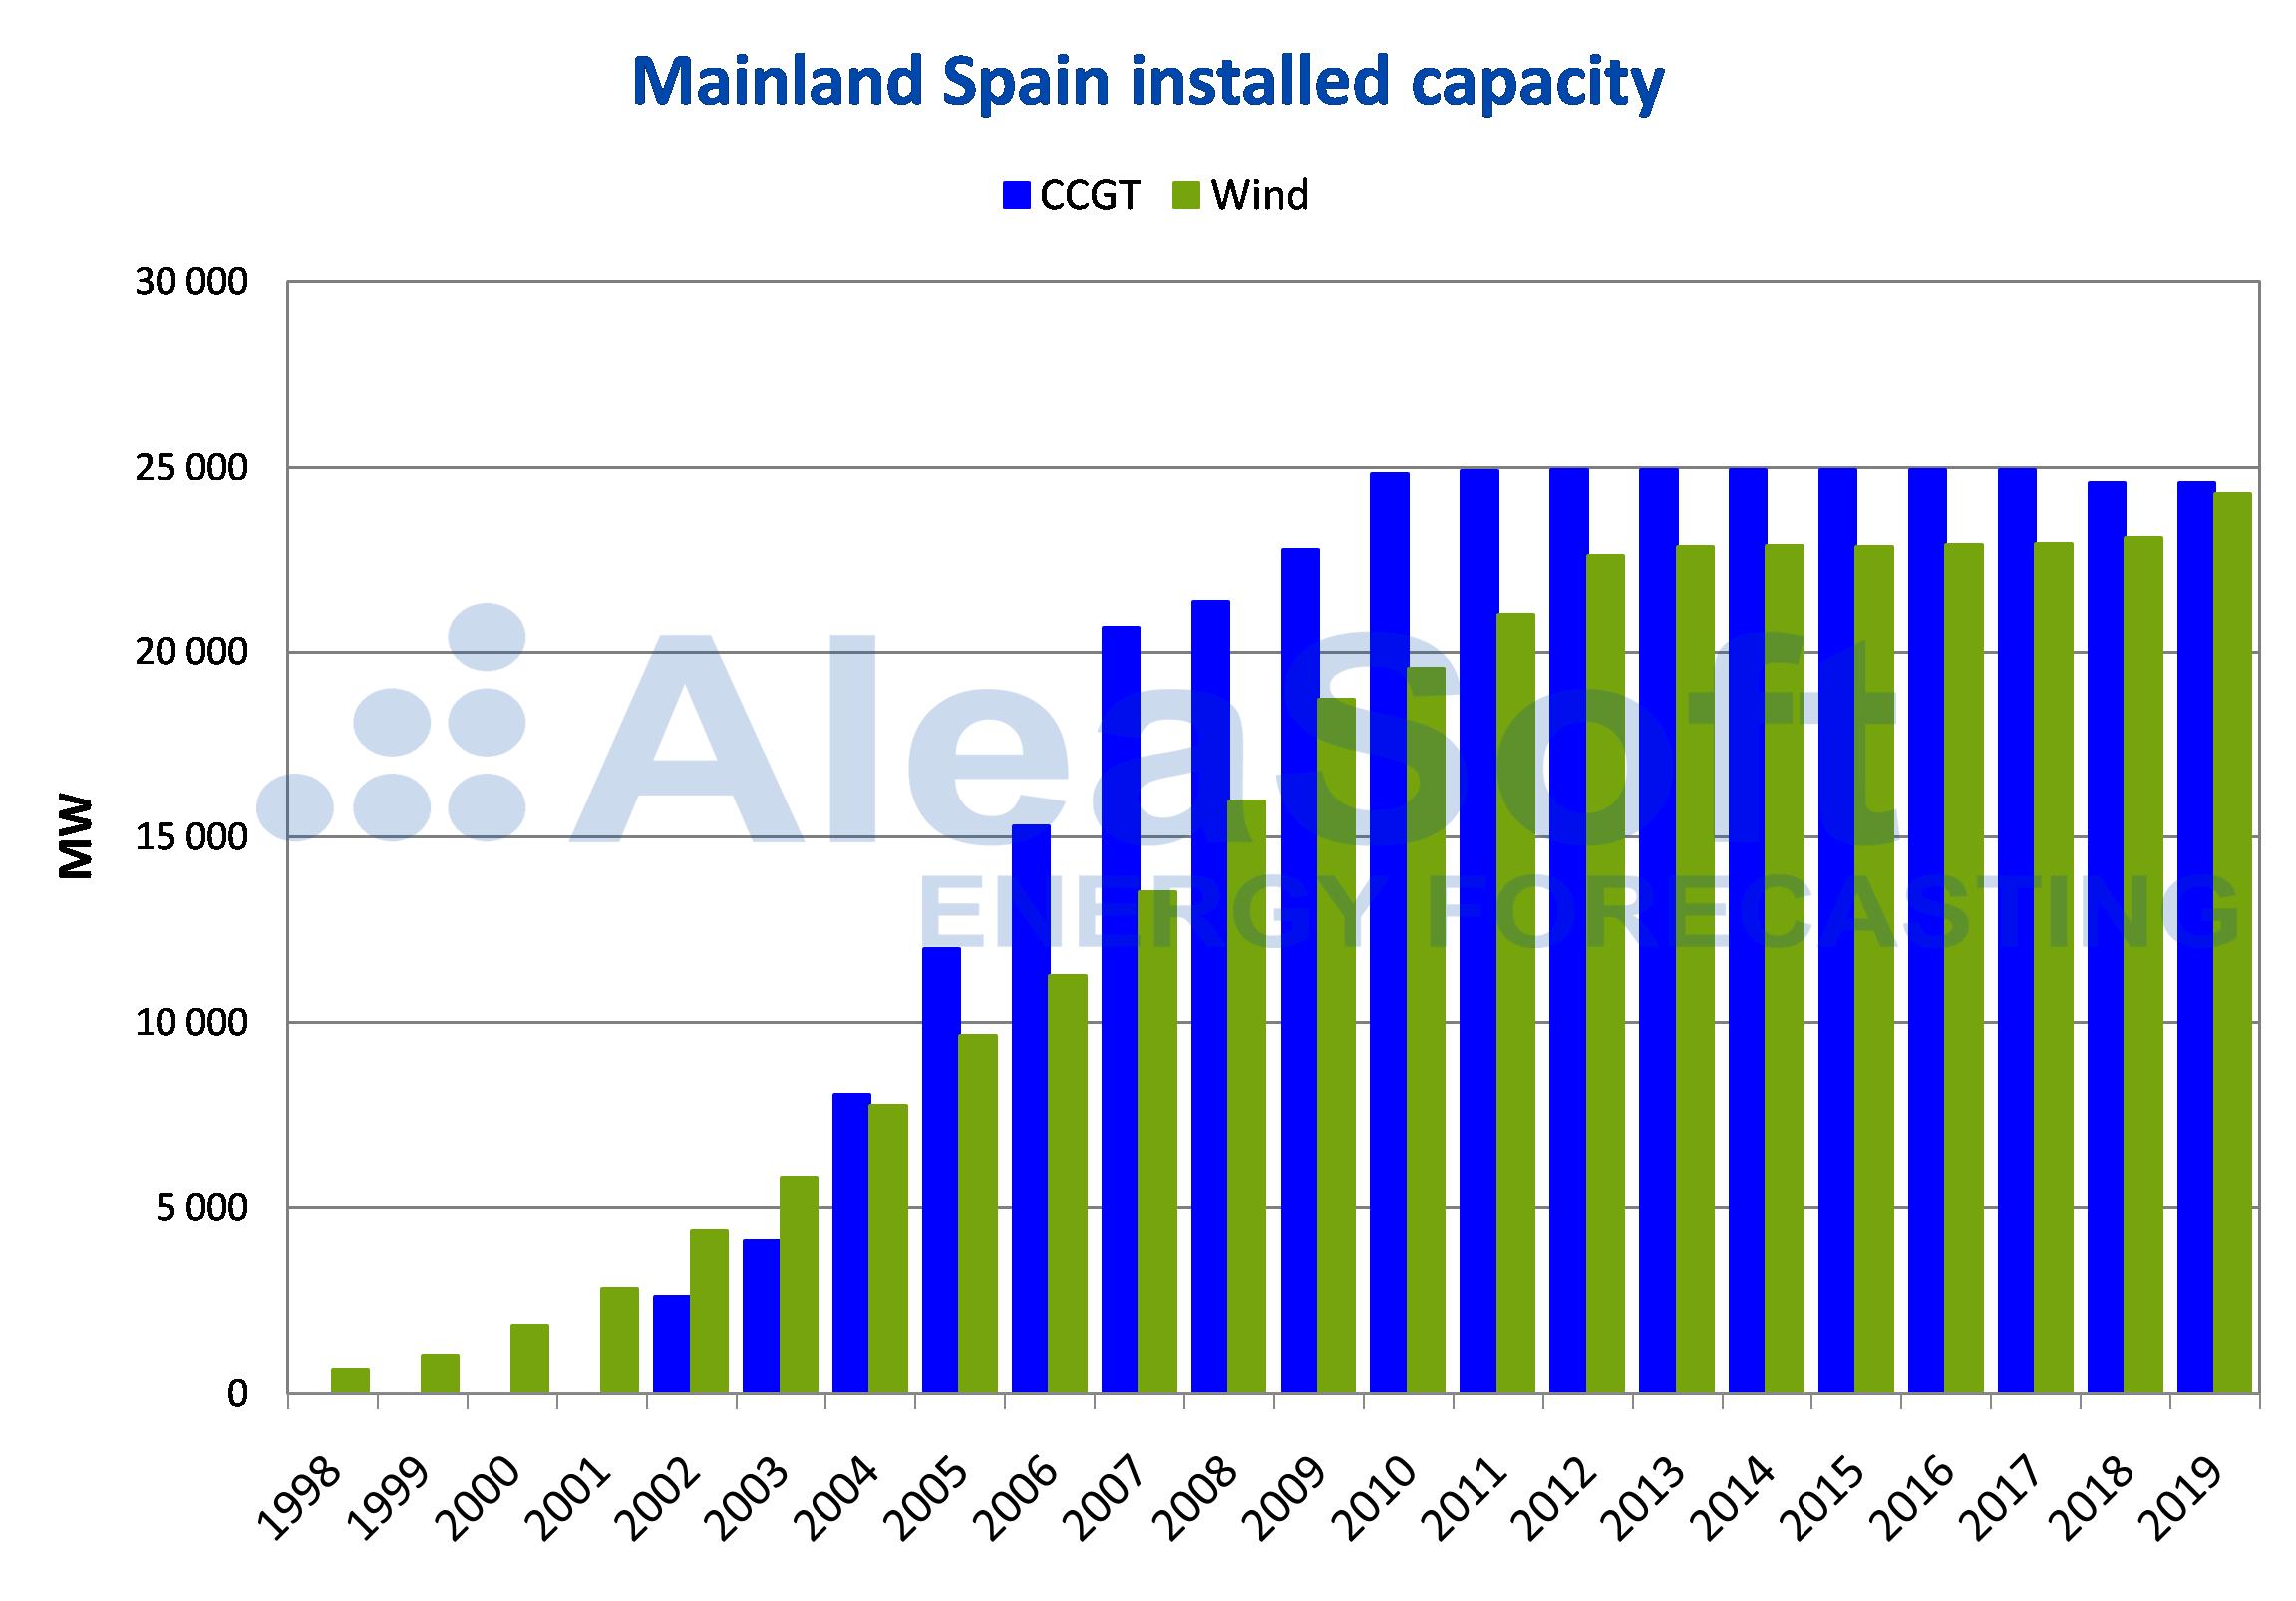 AleaSoft - Installed capacity Mainland Spain